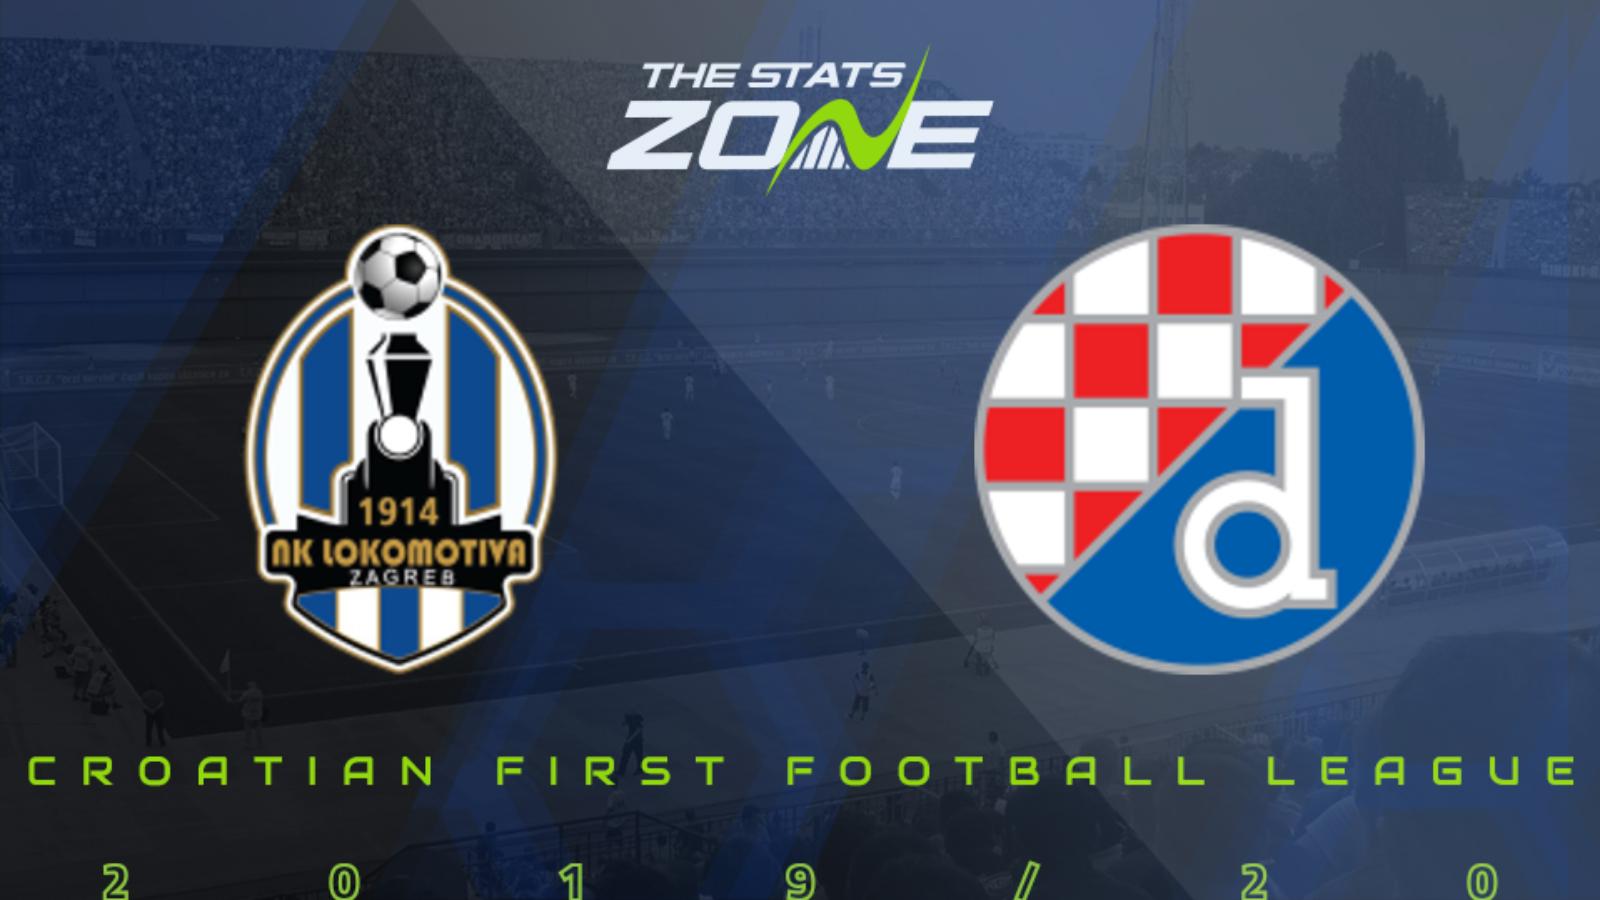 2019 20 Croatian First Football League Lokomotiva Zagreb Vs Dinamo Zagreb Preview Prediction The Stats Zone